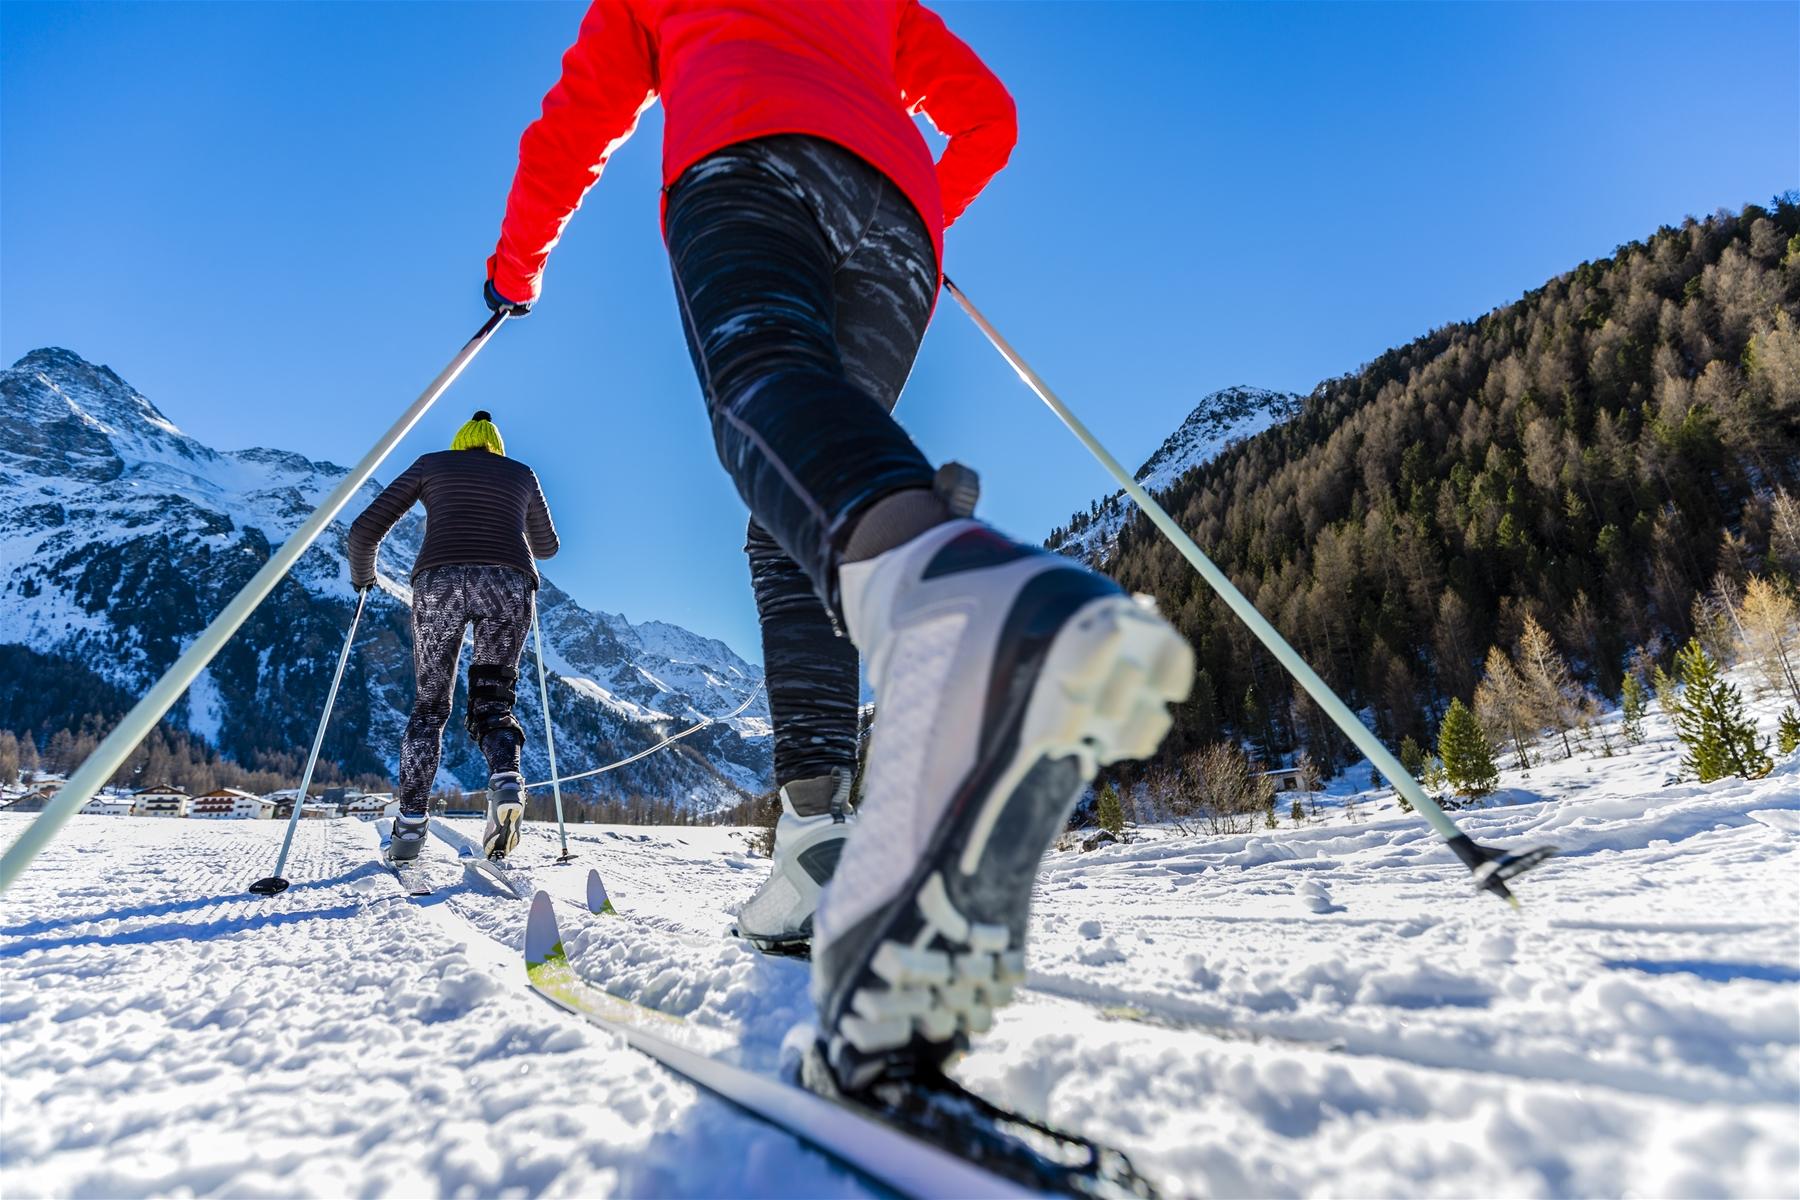 Dillon-Silverthorne Nordic Skiing